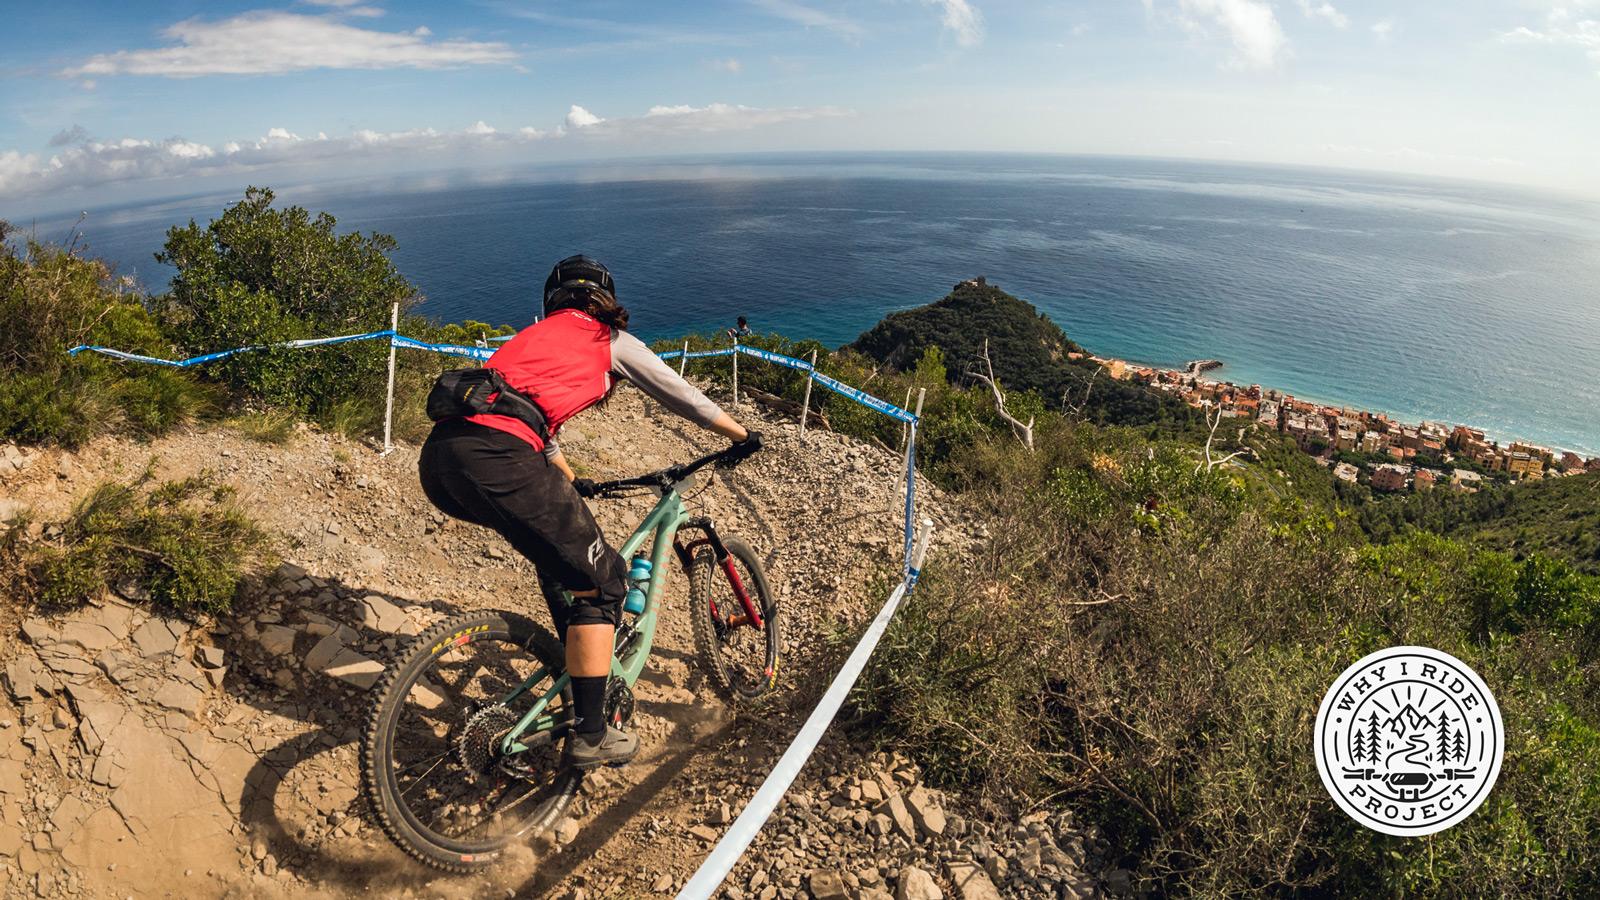 Porsha Murdock racing mountain bikes on the cliffs of Italy.